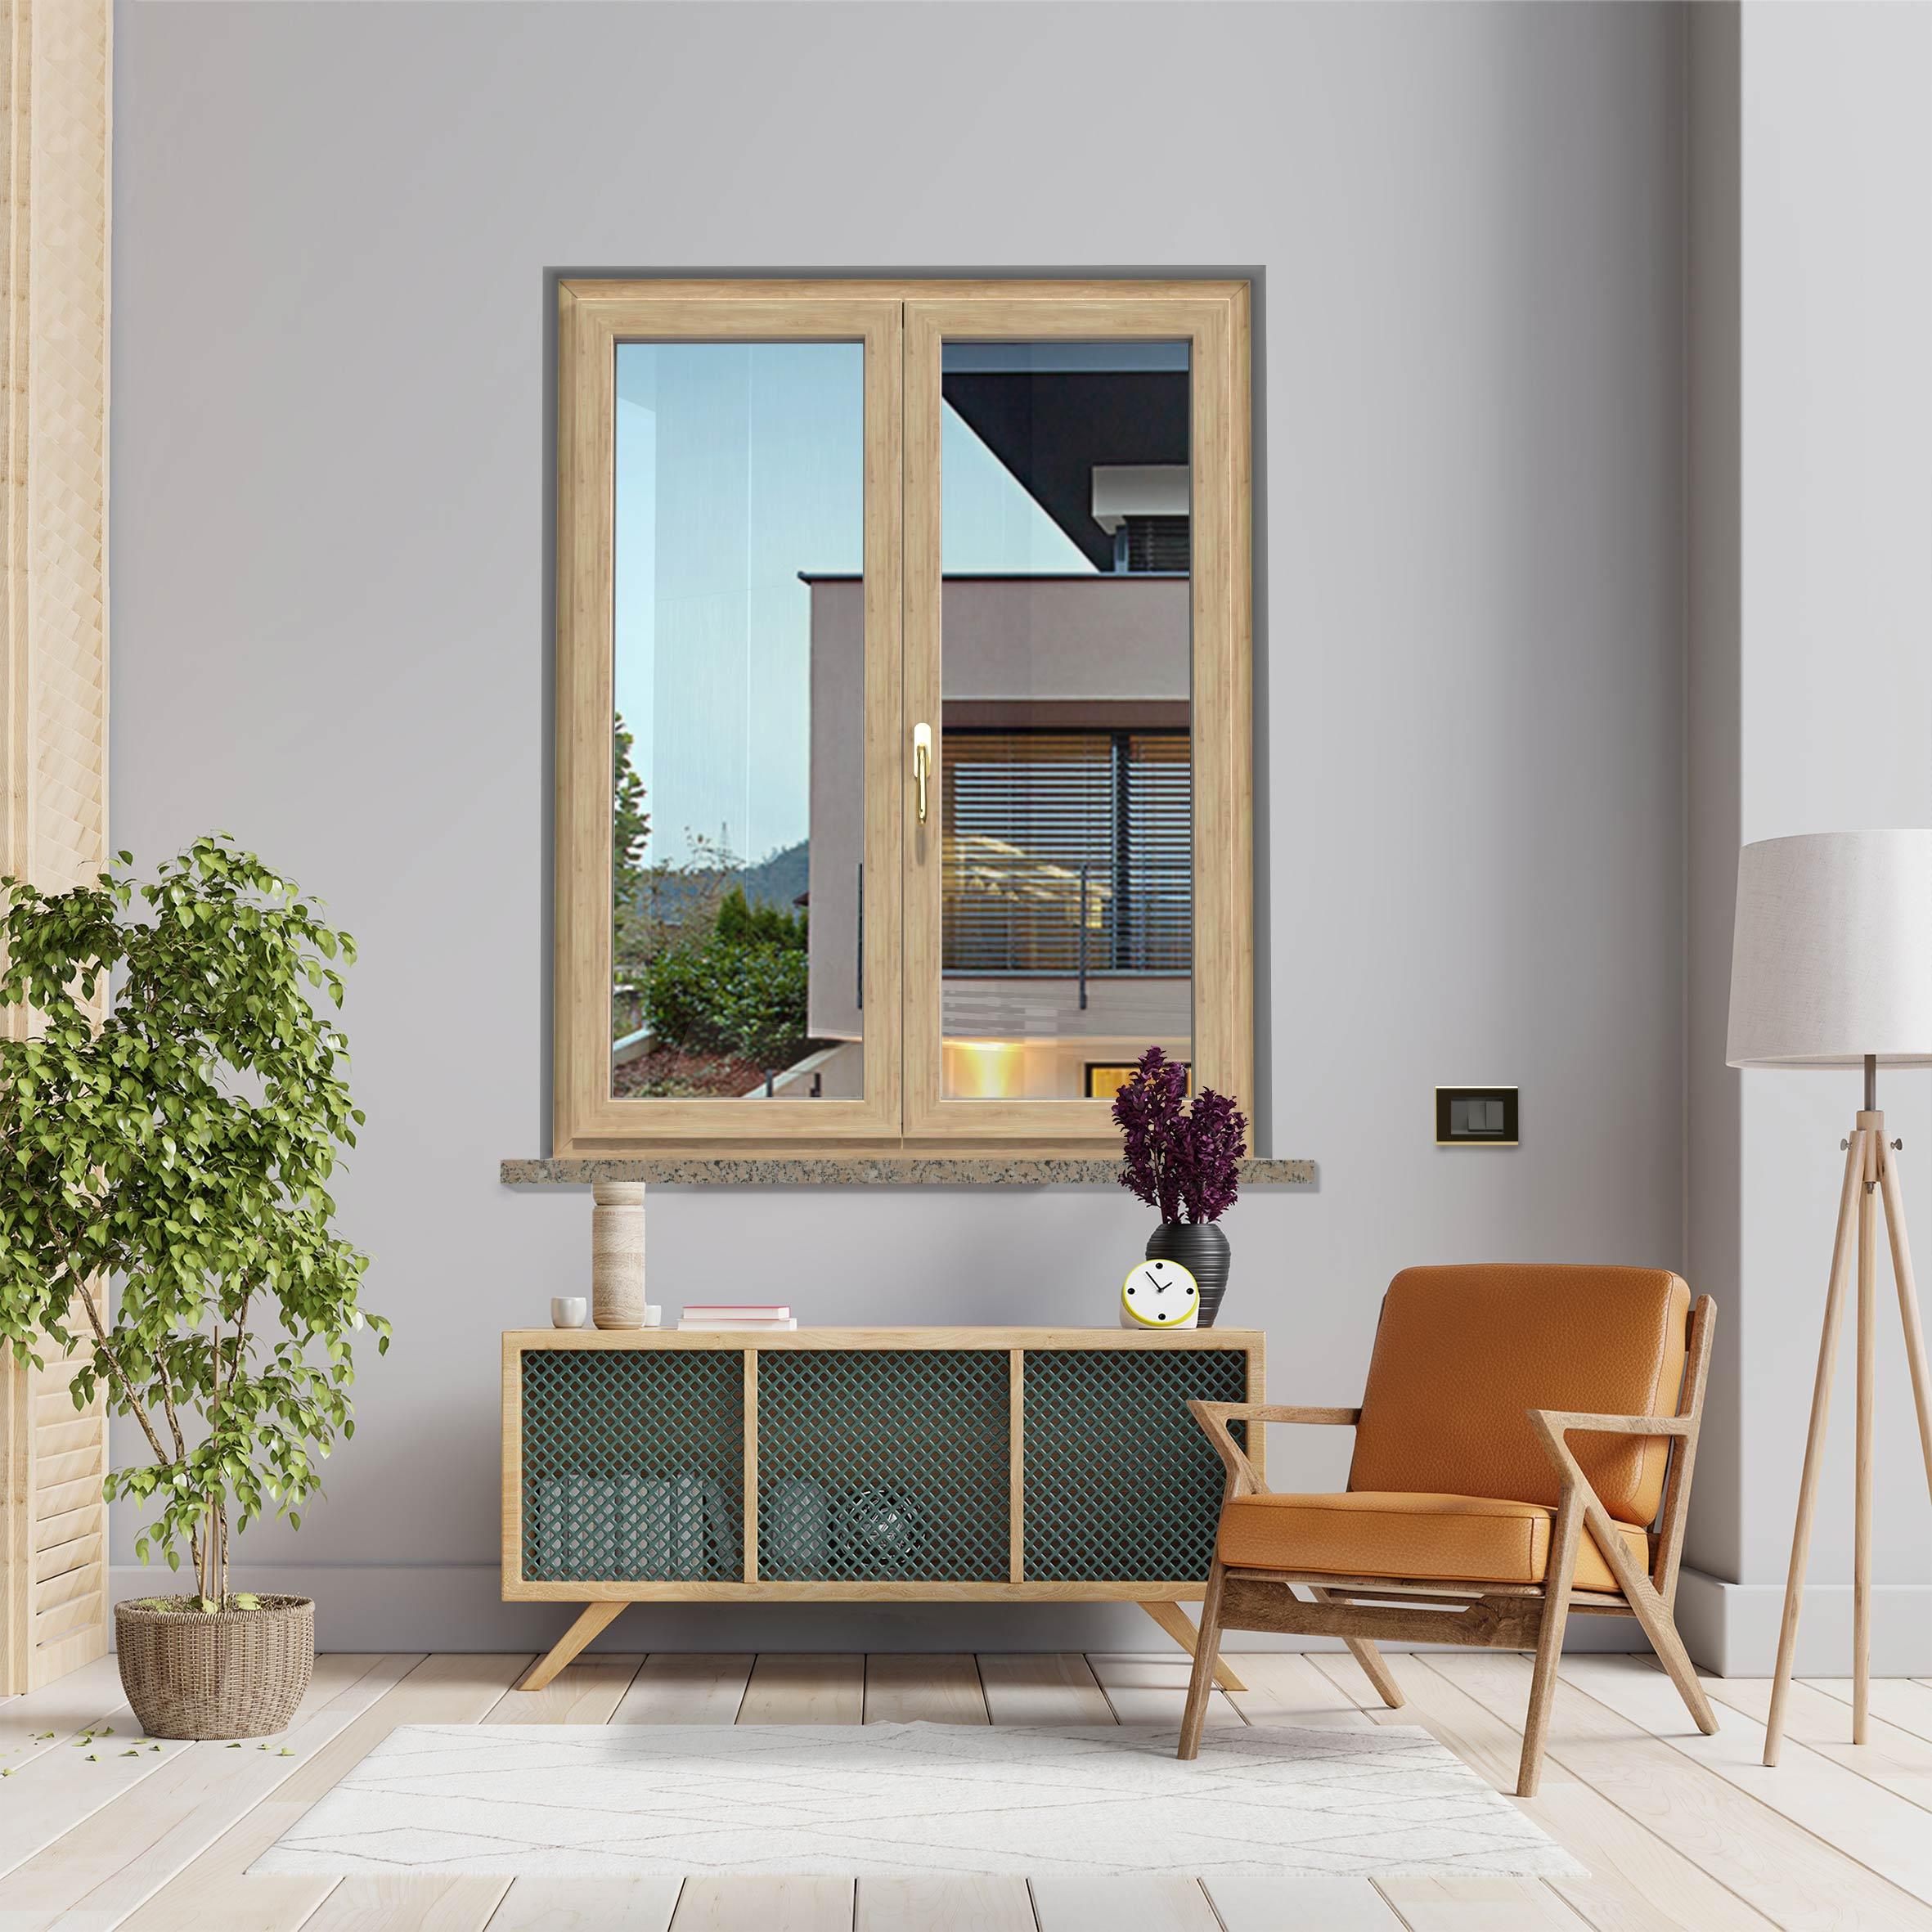 https://www.allpaint.it/wp-content/uploads/2021/09/finestre-woodlineplus-legno-allpaint-1.jpg